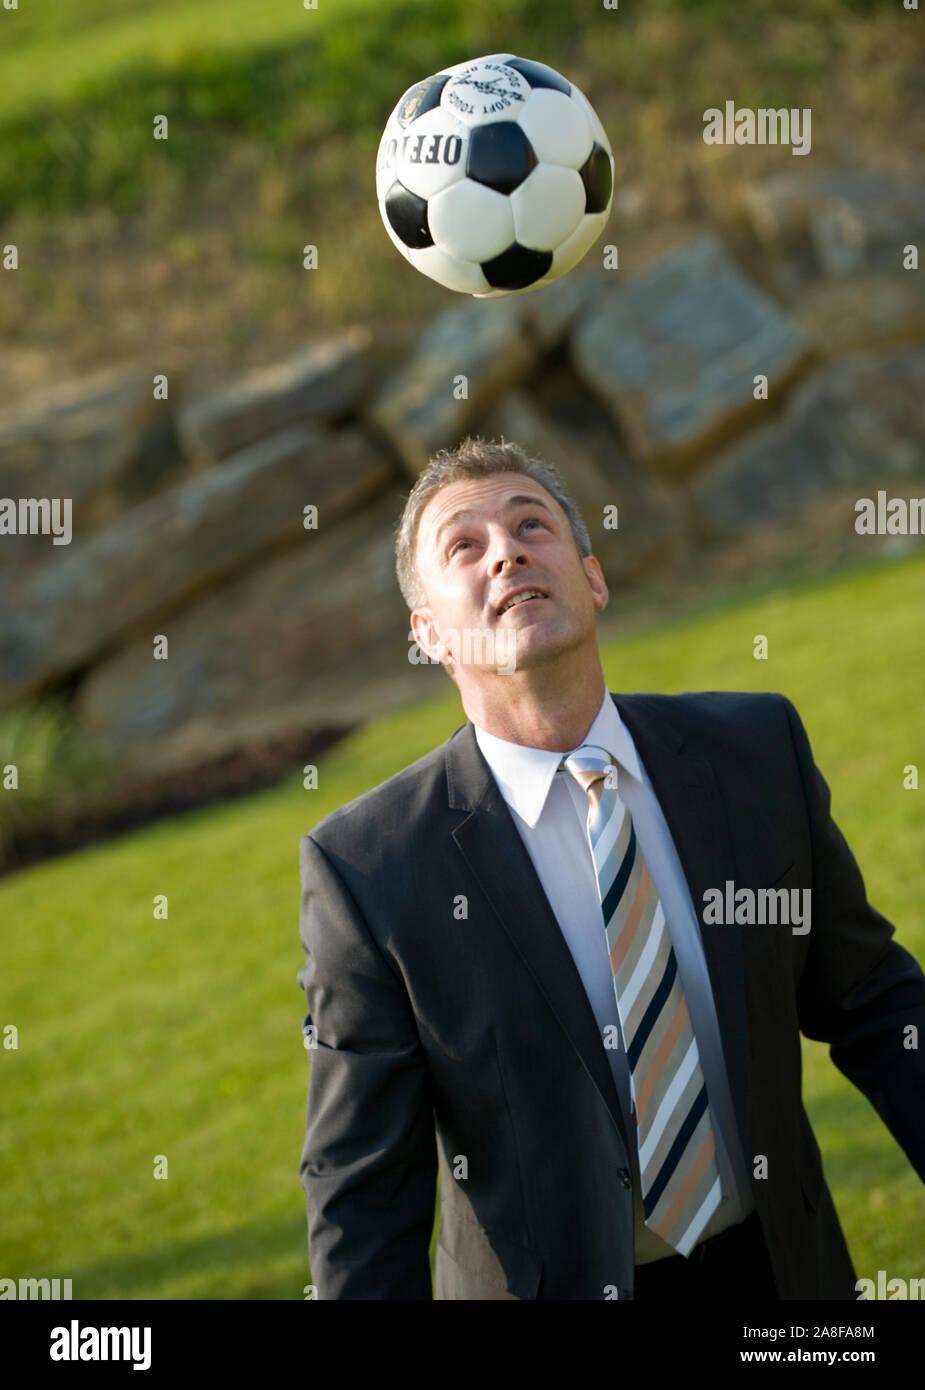 Gecshäftsmann spielt Fussball, Pause, Mittagspause,  MR:Yes Stock Photo